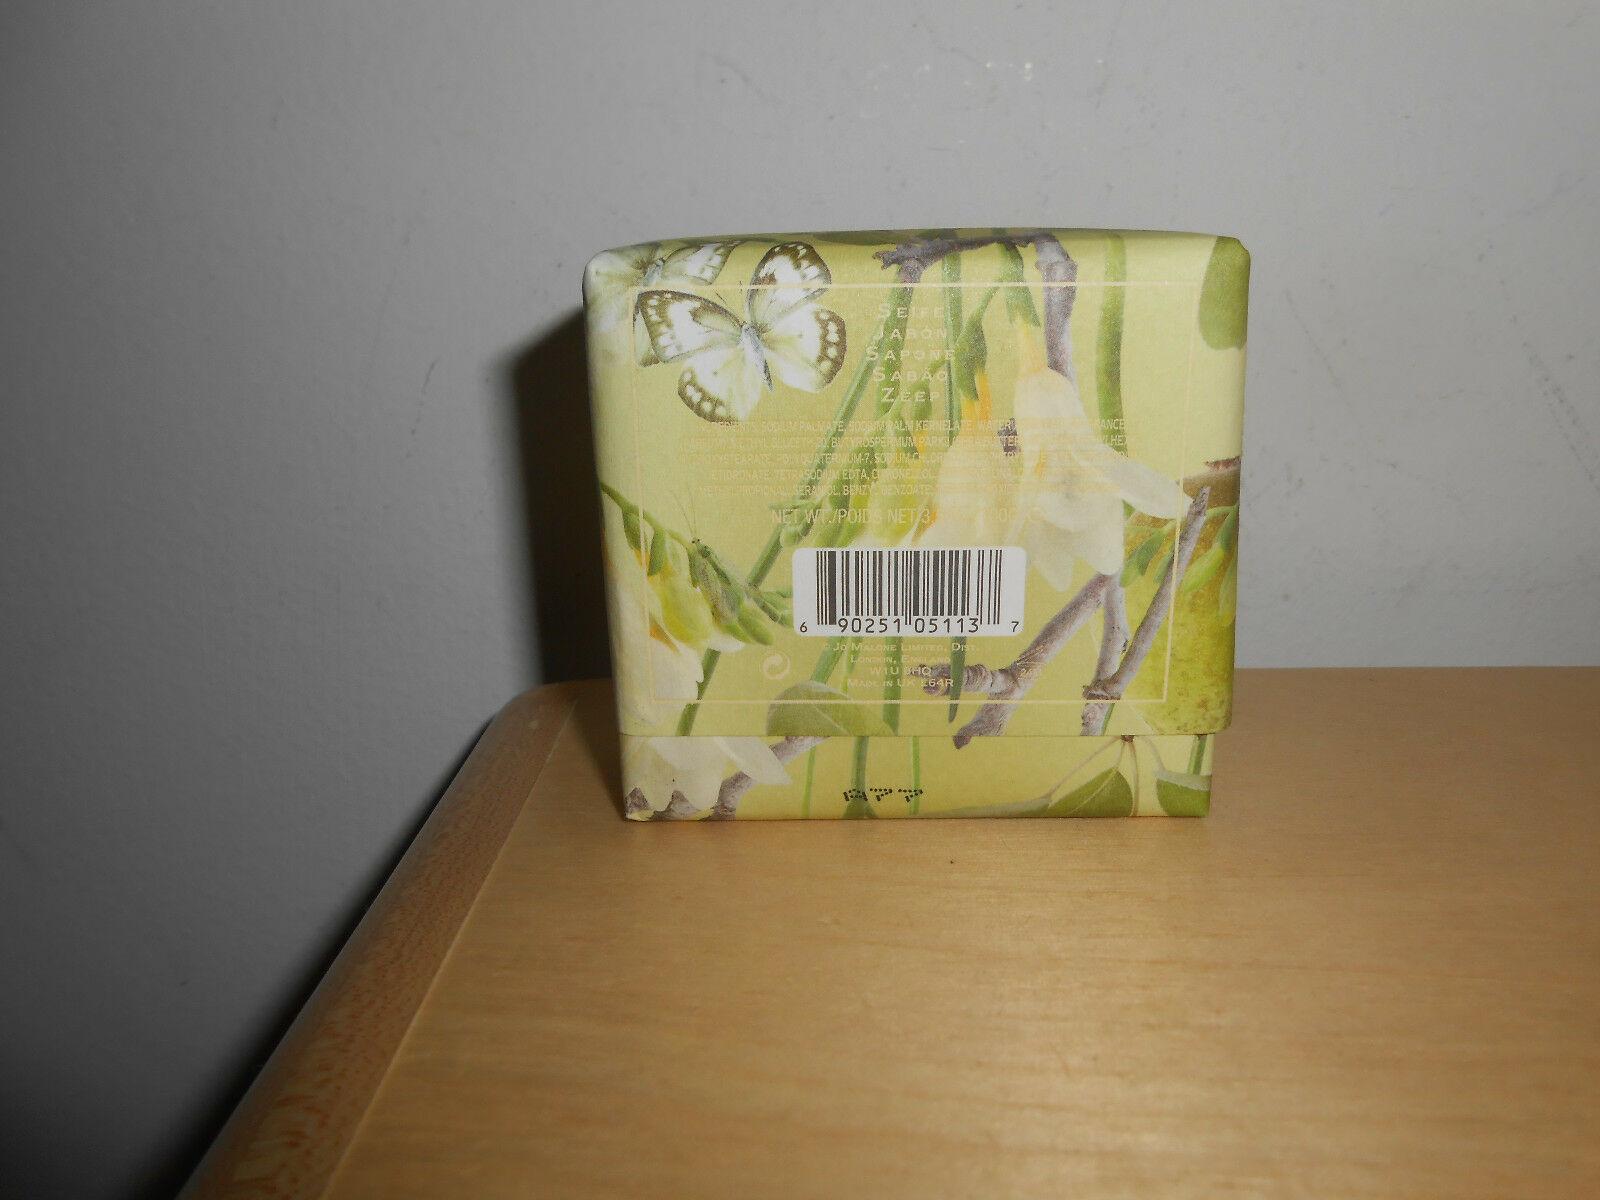 Jo Malone English Pear & Freesia Soap 3.5 oz 100 gr New In Packaging